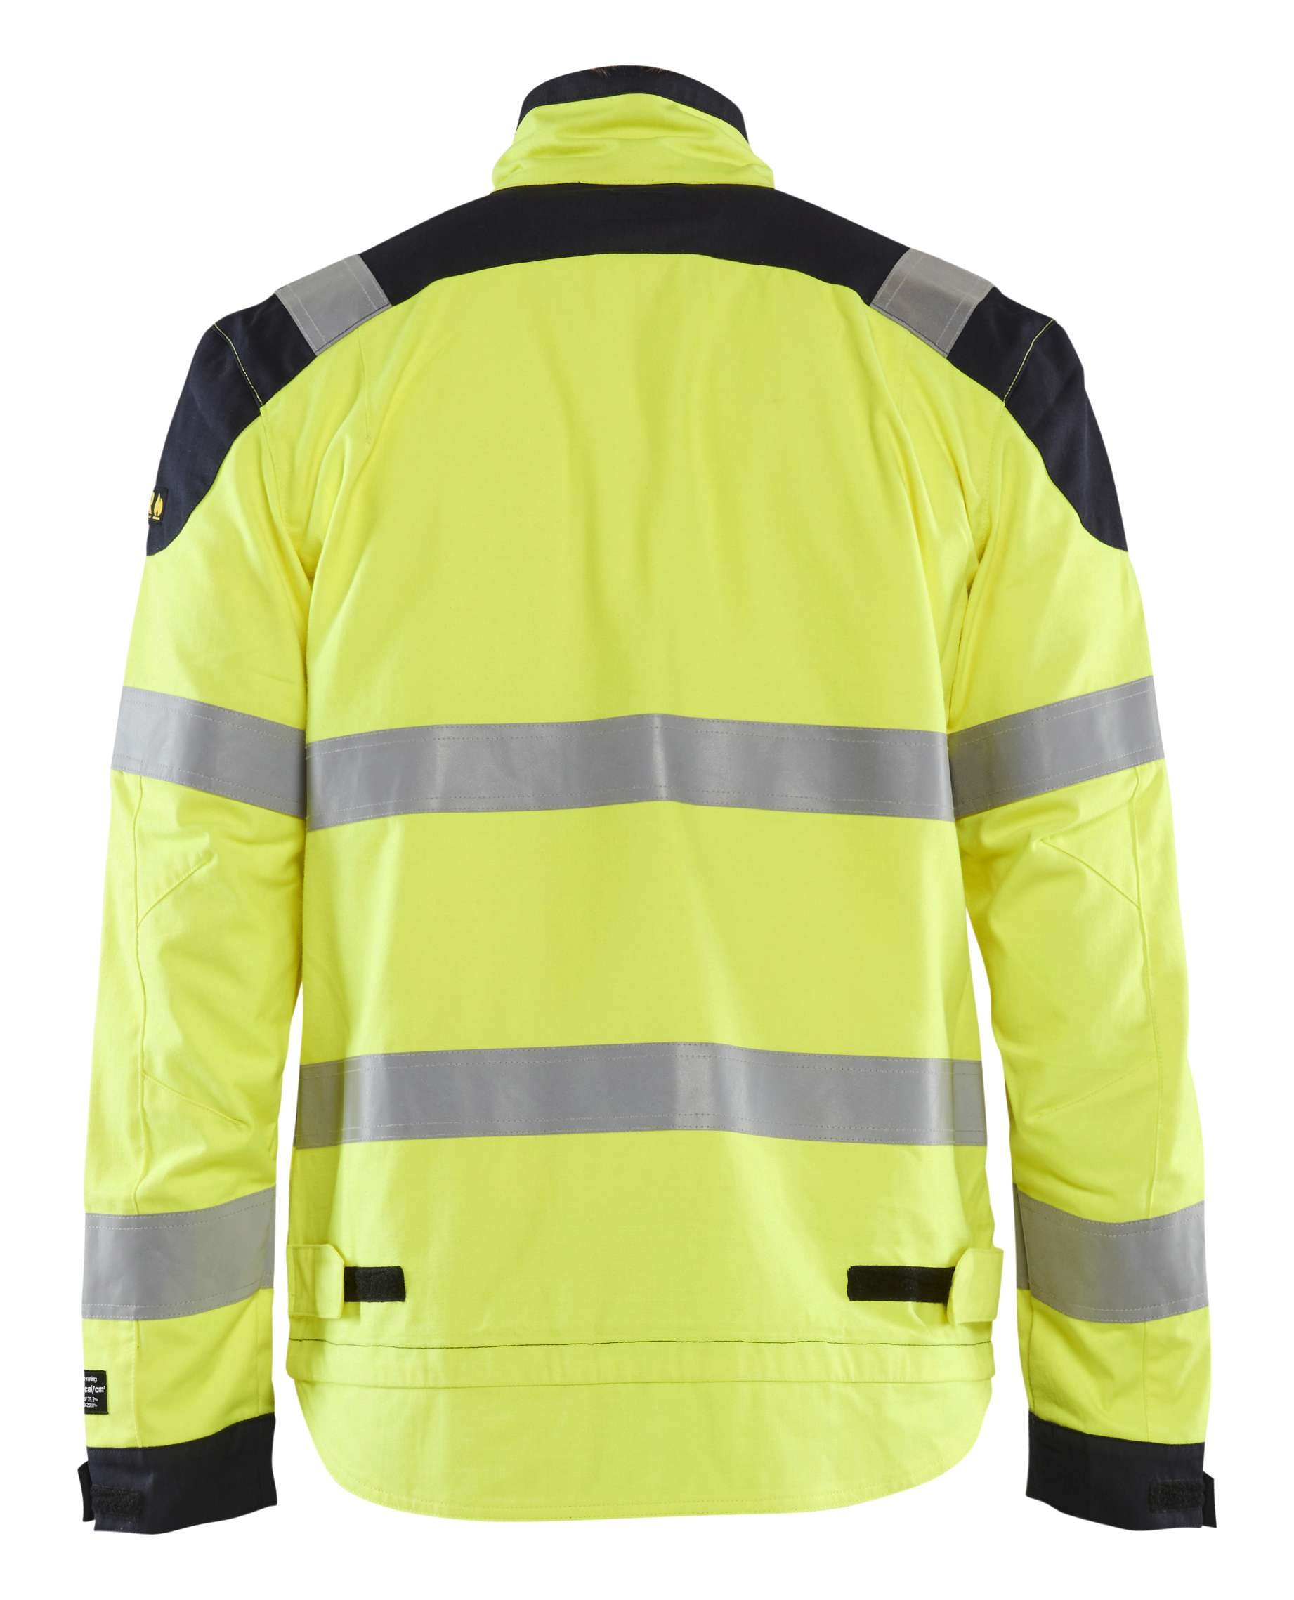 Blaklader Combi-jacks 40891512 Multinorm geel-marineblauw(3389)